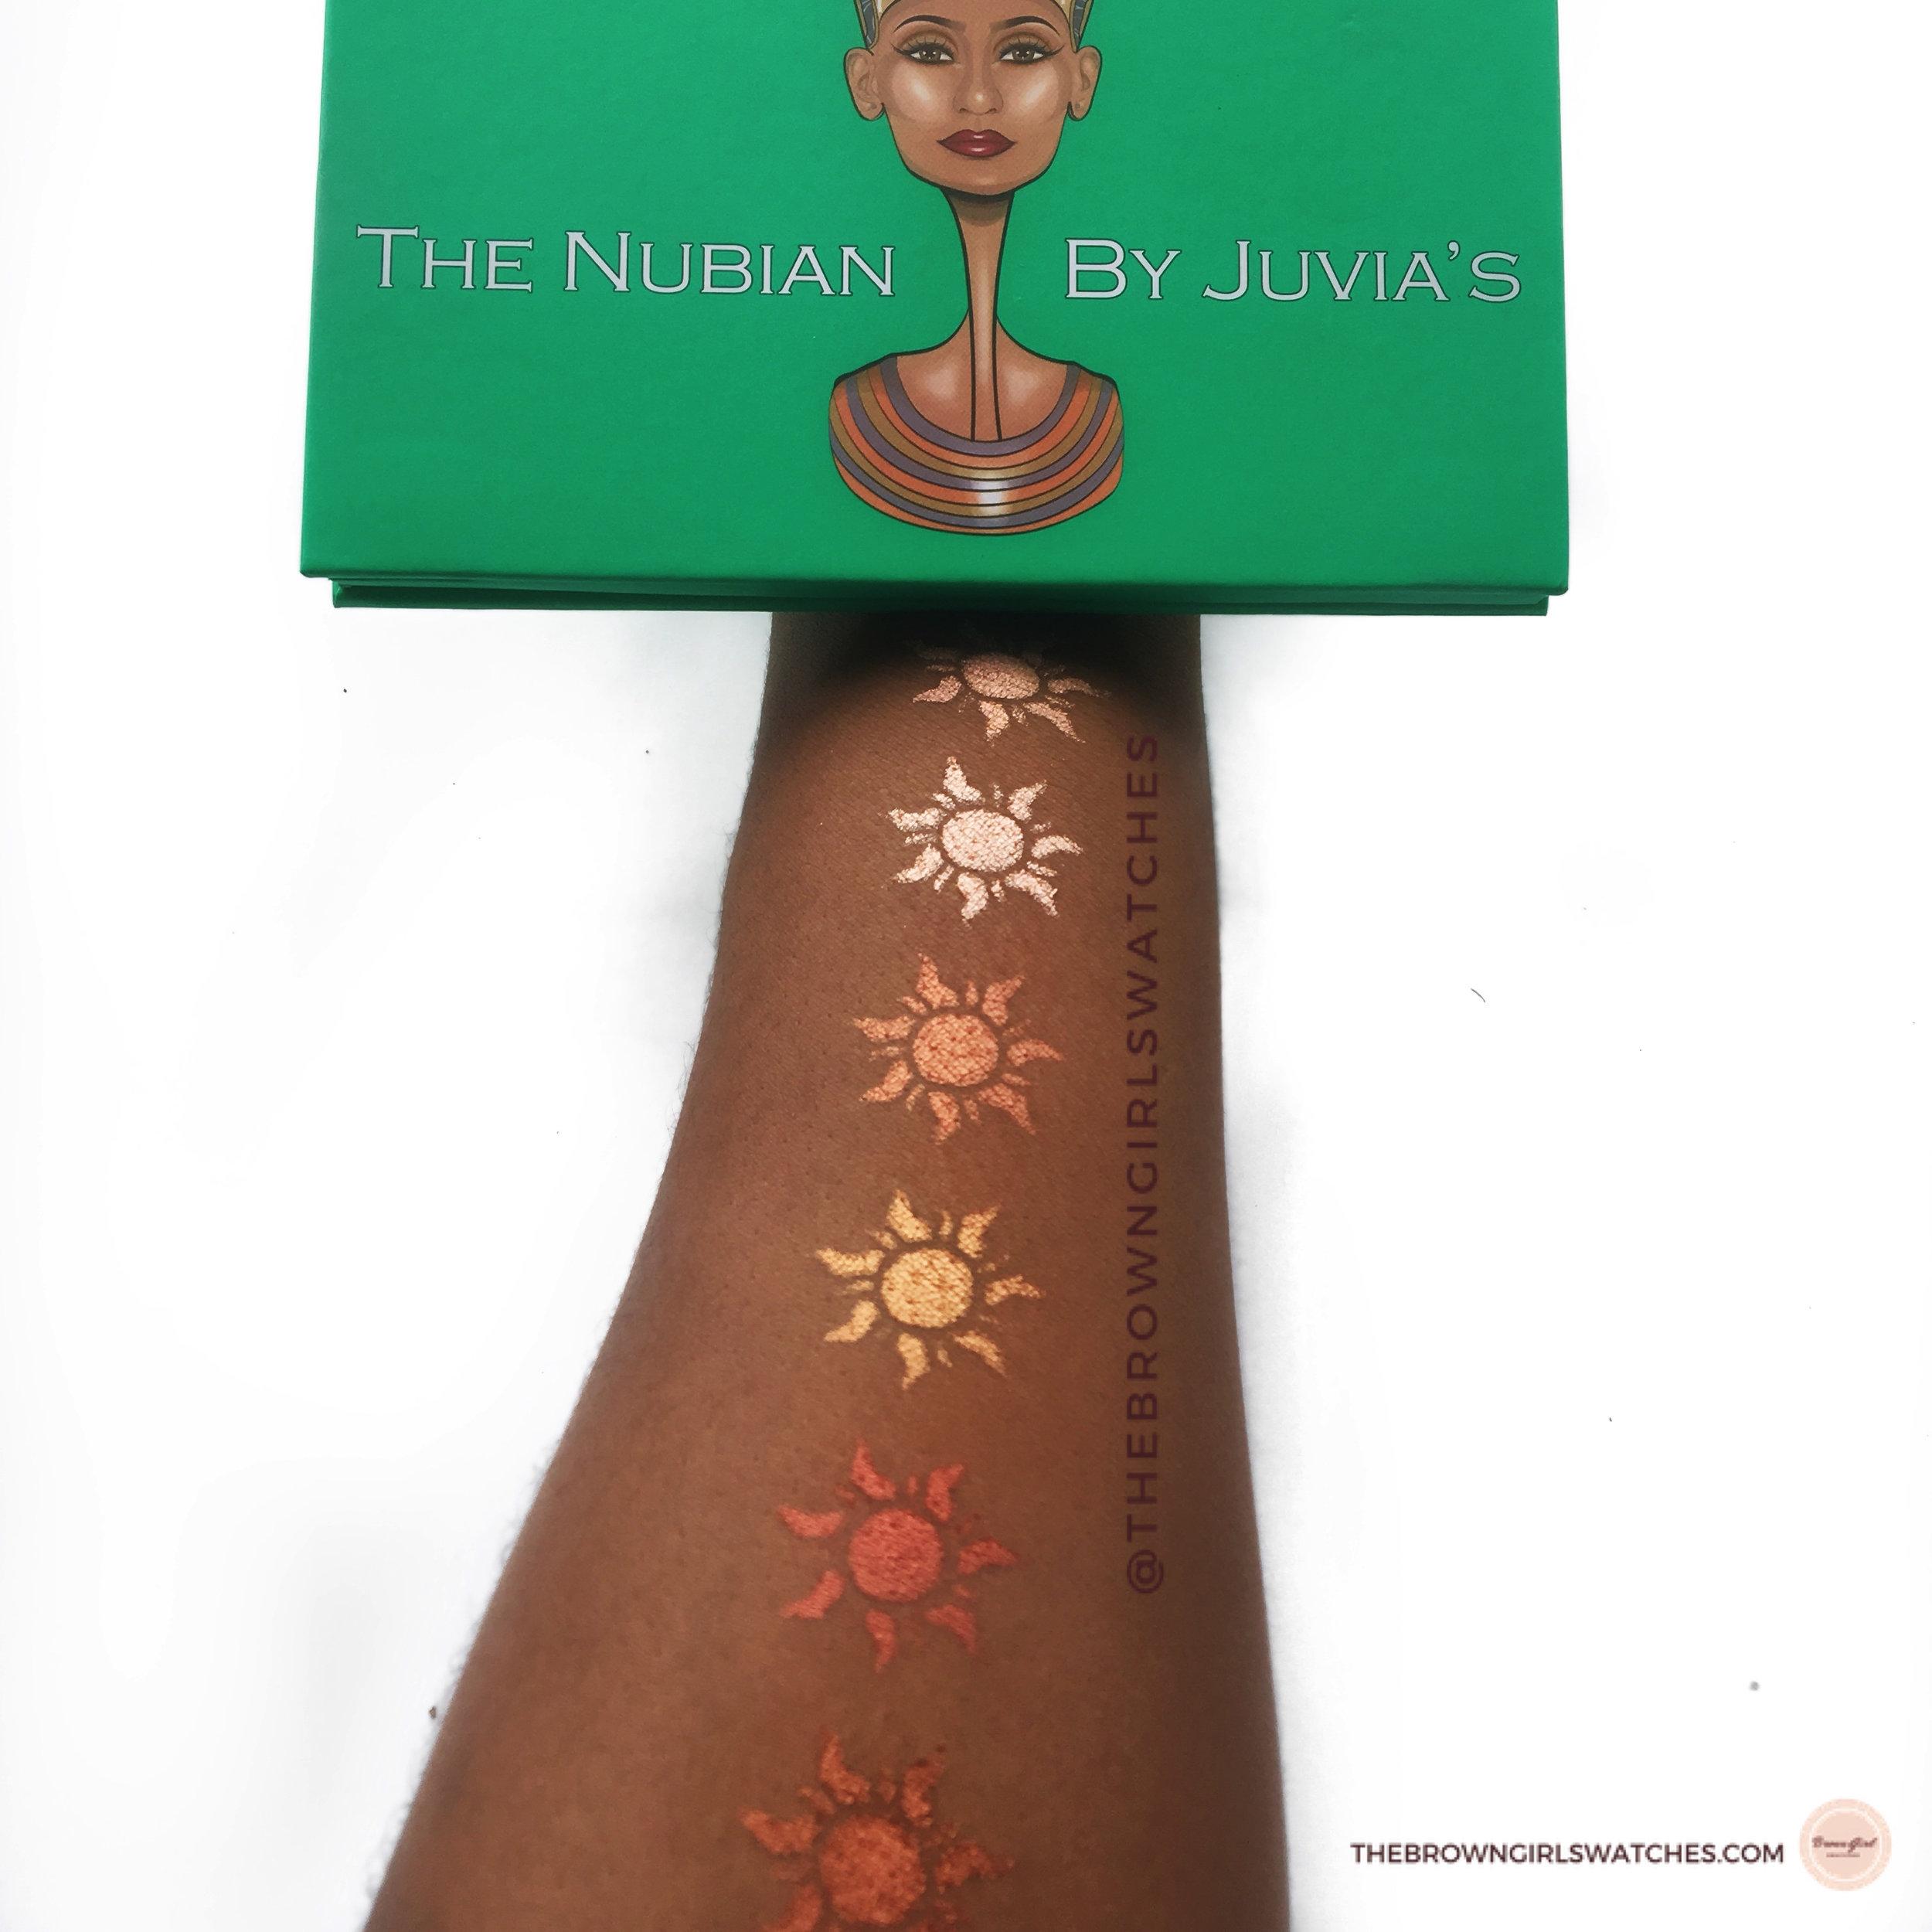 Nubian 1 Palette Swatches (NC50 skin)